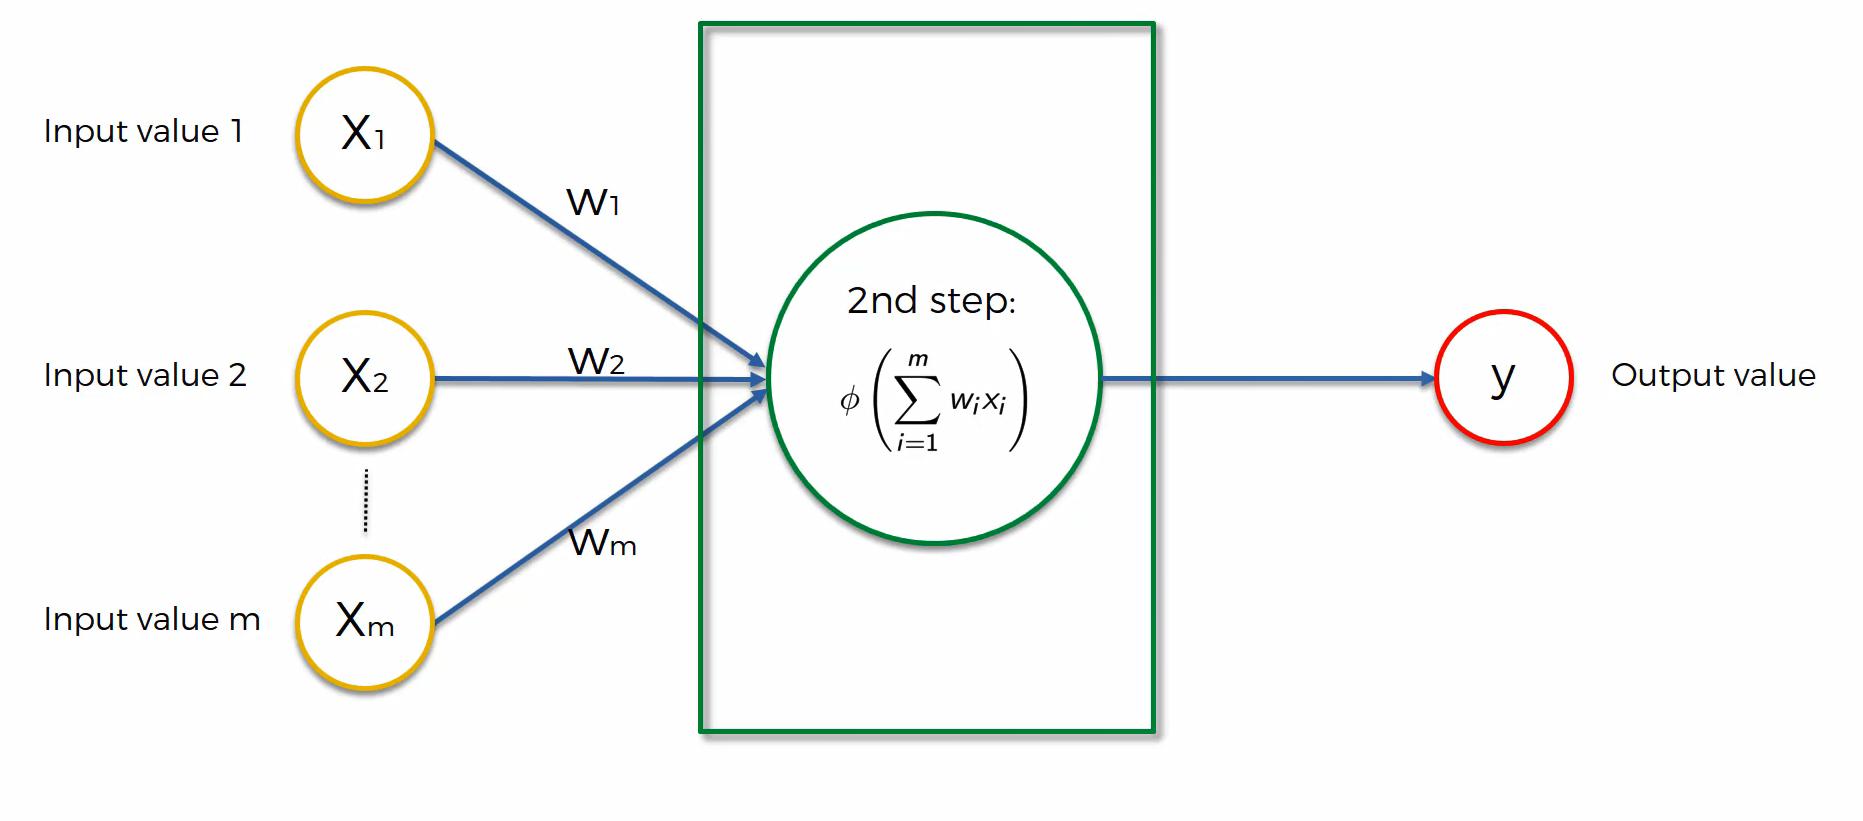 Maschinenlernen. Deep Learning. Künstliche Neuronale Netzwerke. Einführung Schritt 3